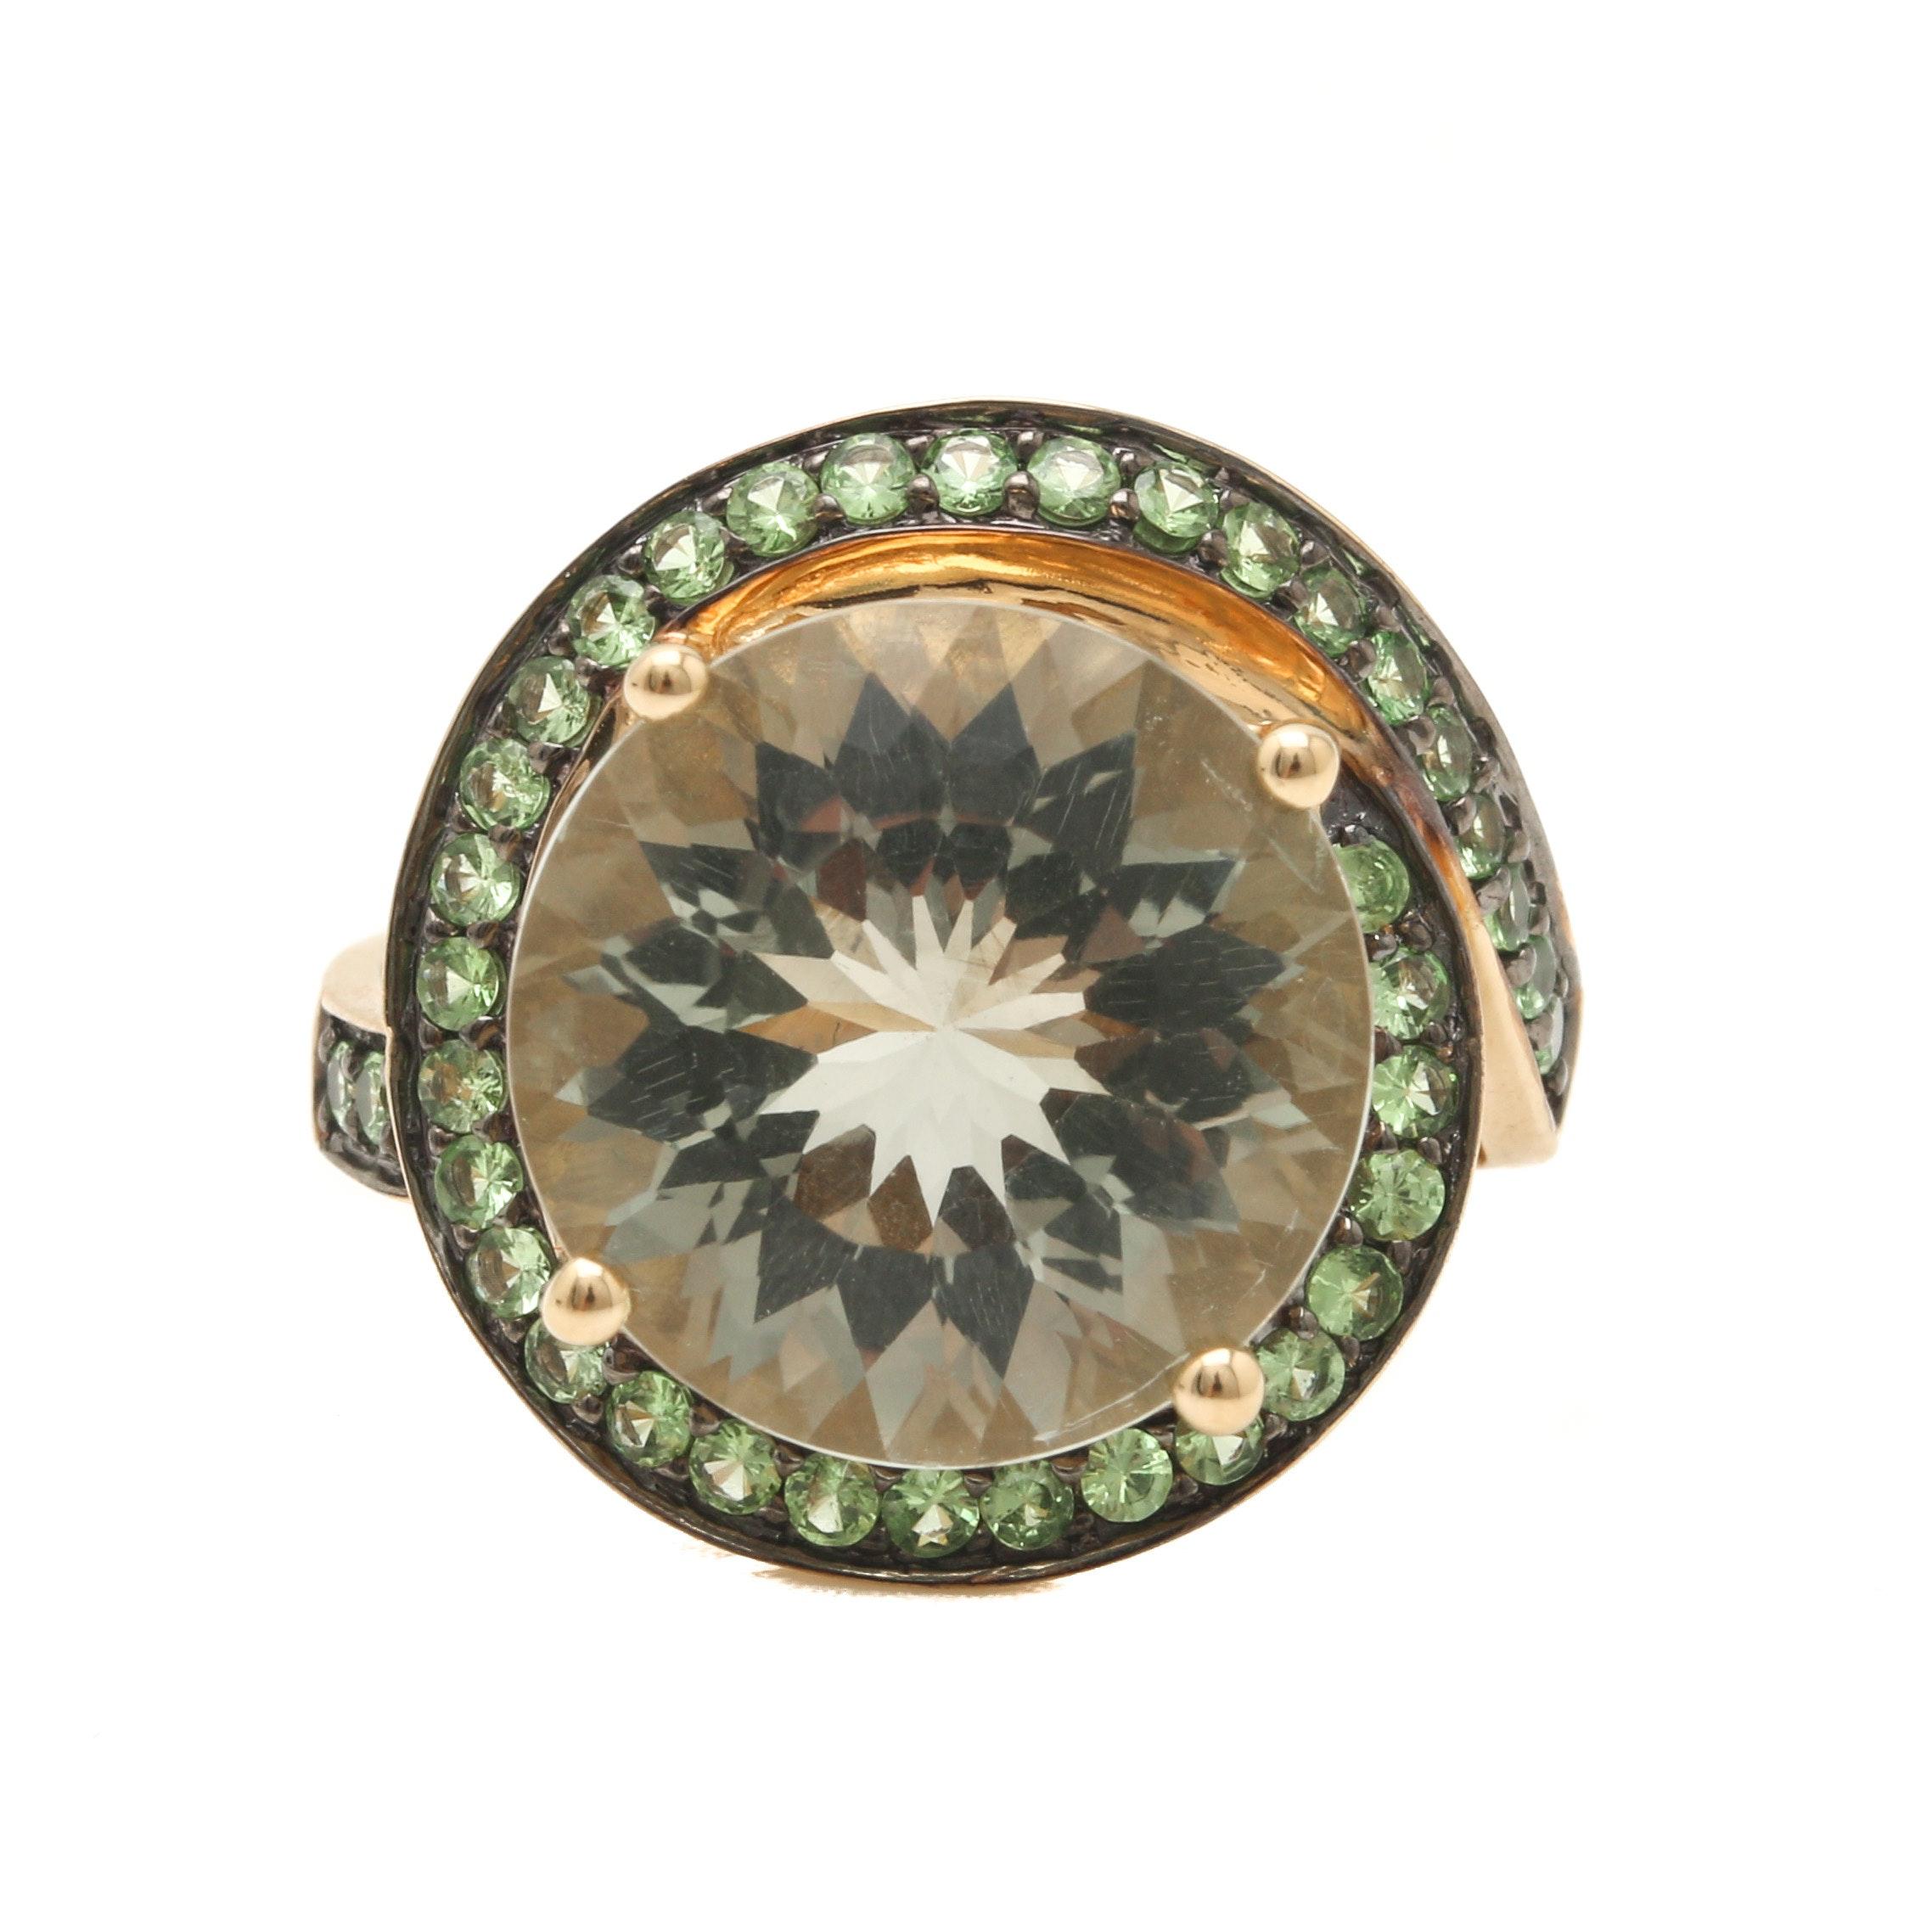 14K Yellow Gold 7.80 CT Praseolite and Demantoid Garnet Ring